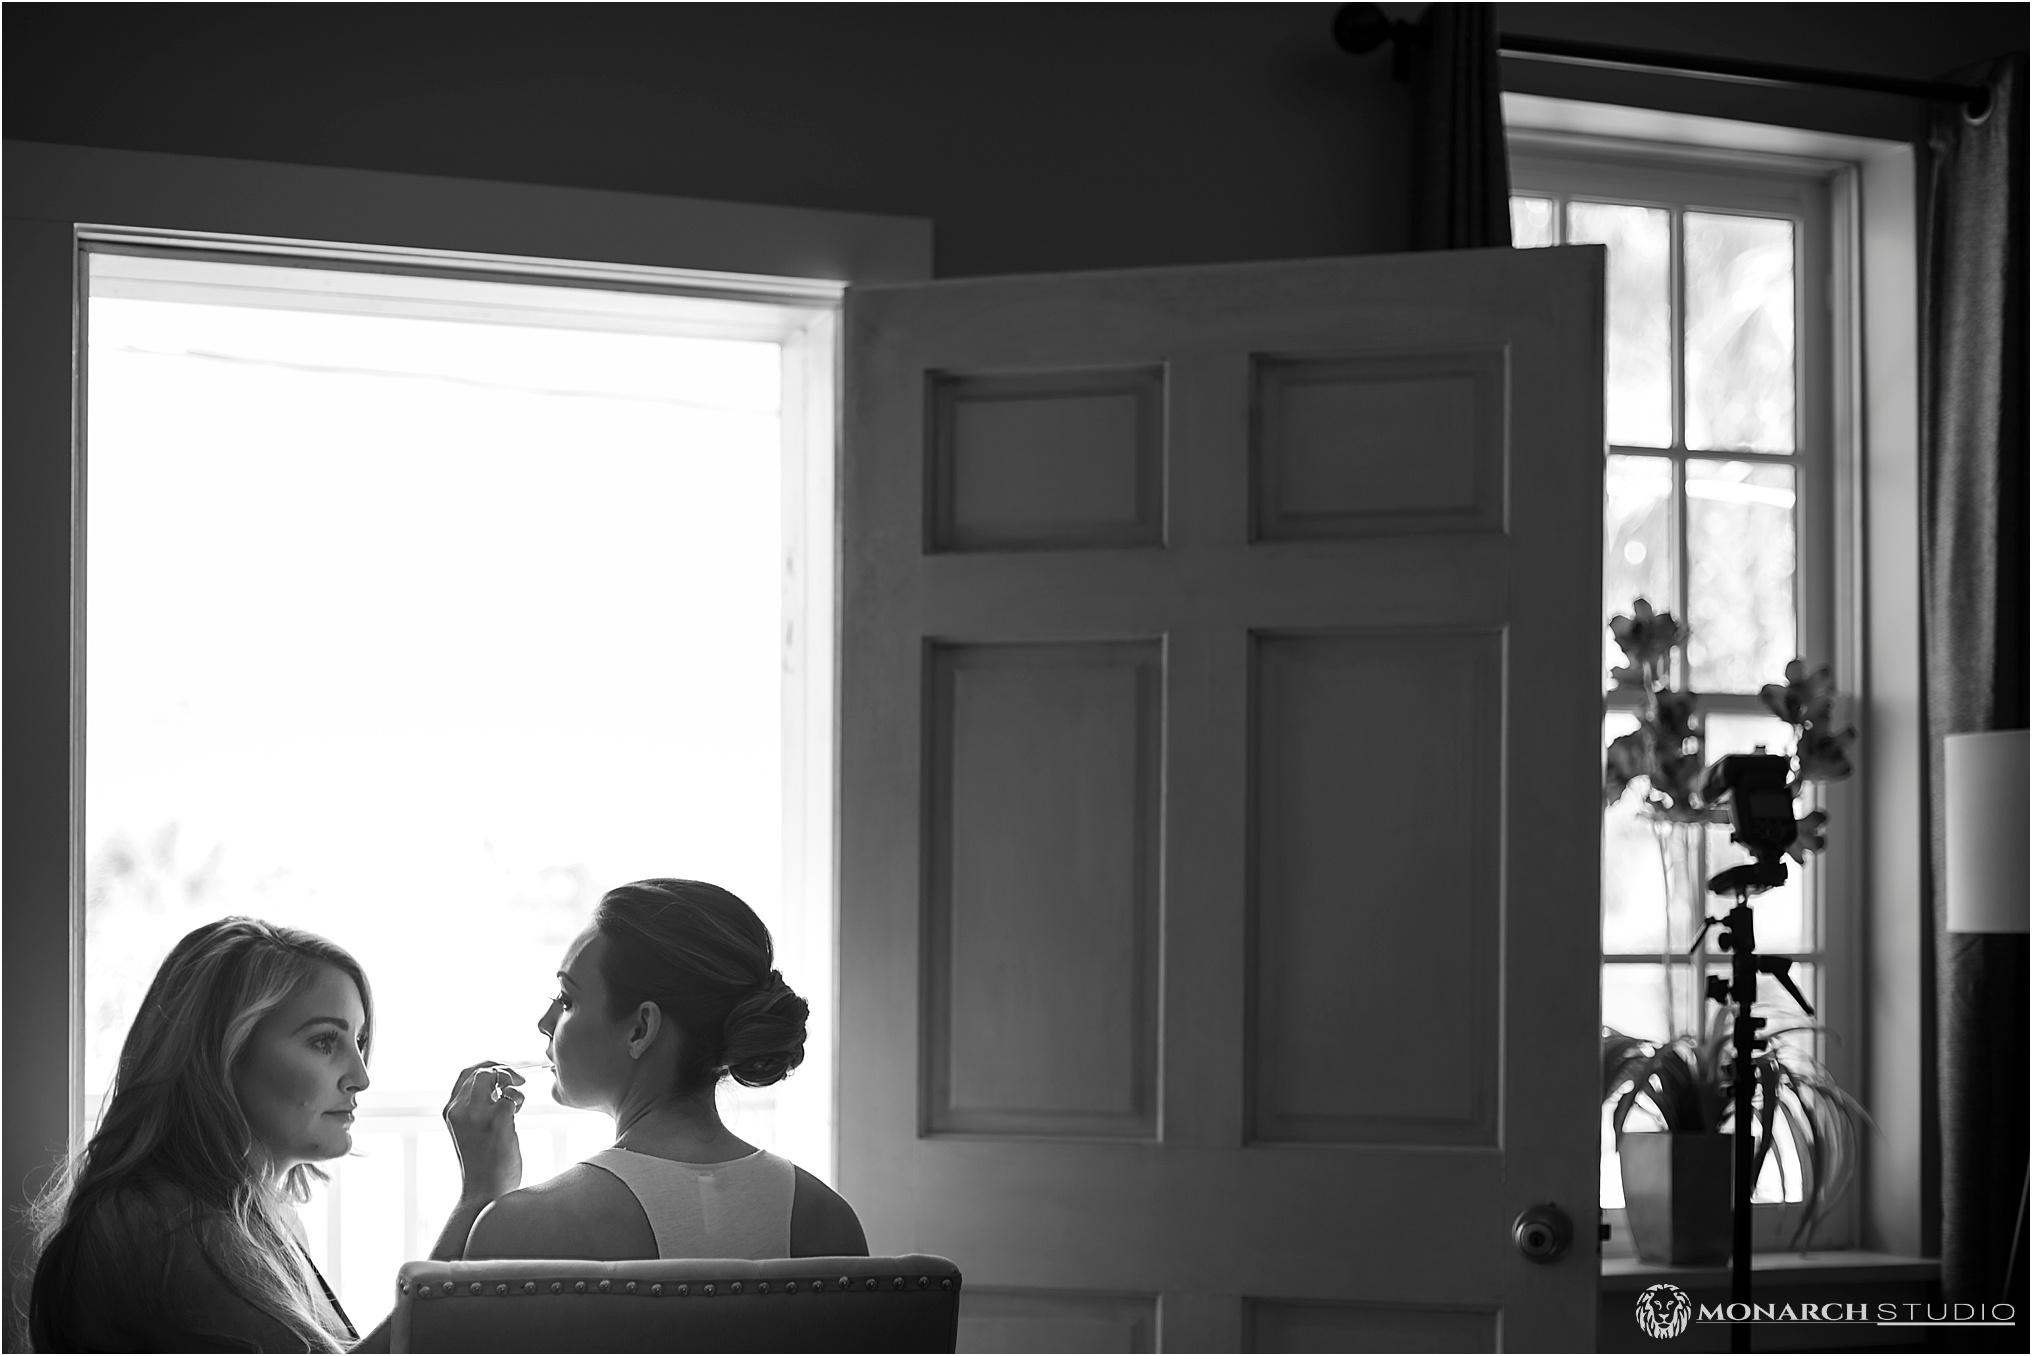 020-whiteroom-wedding-photographer-2019-05-22_0002.jpg